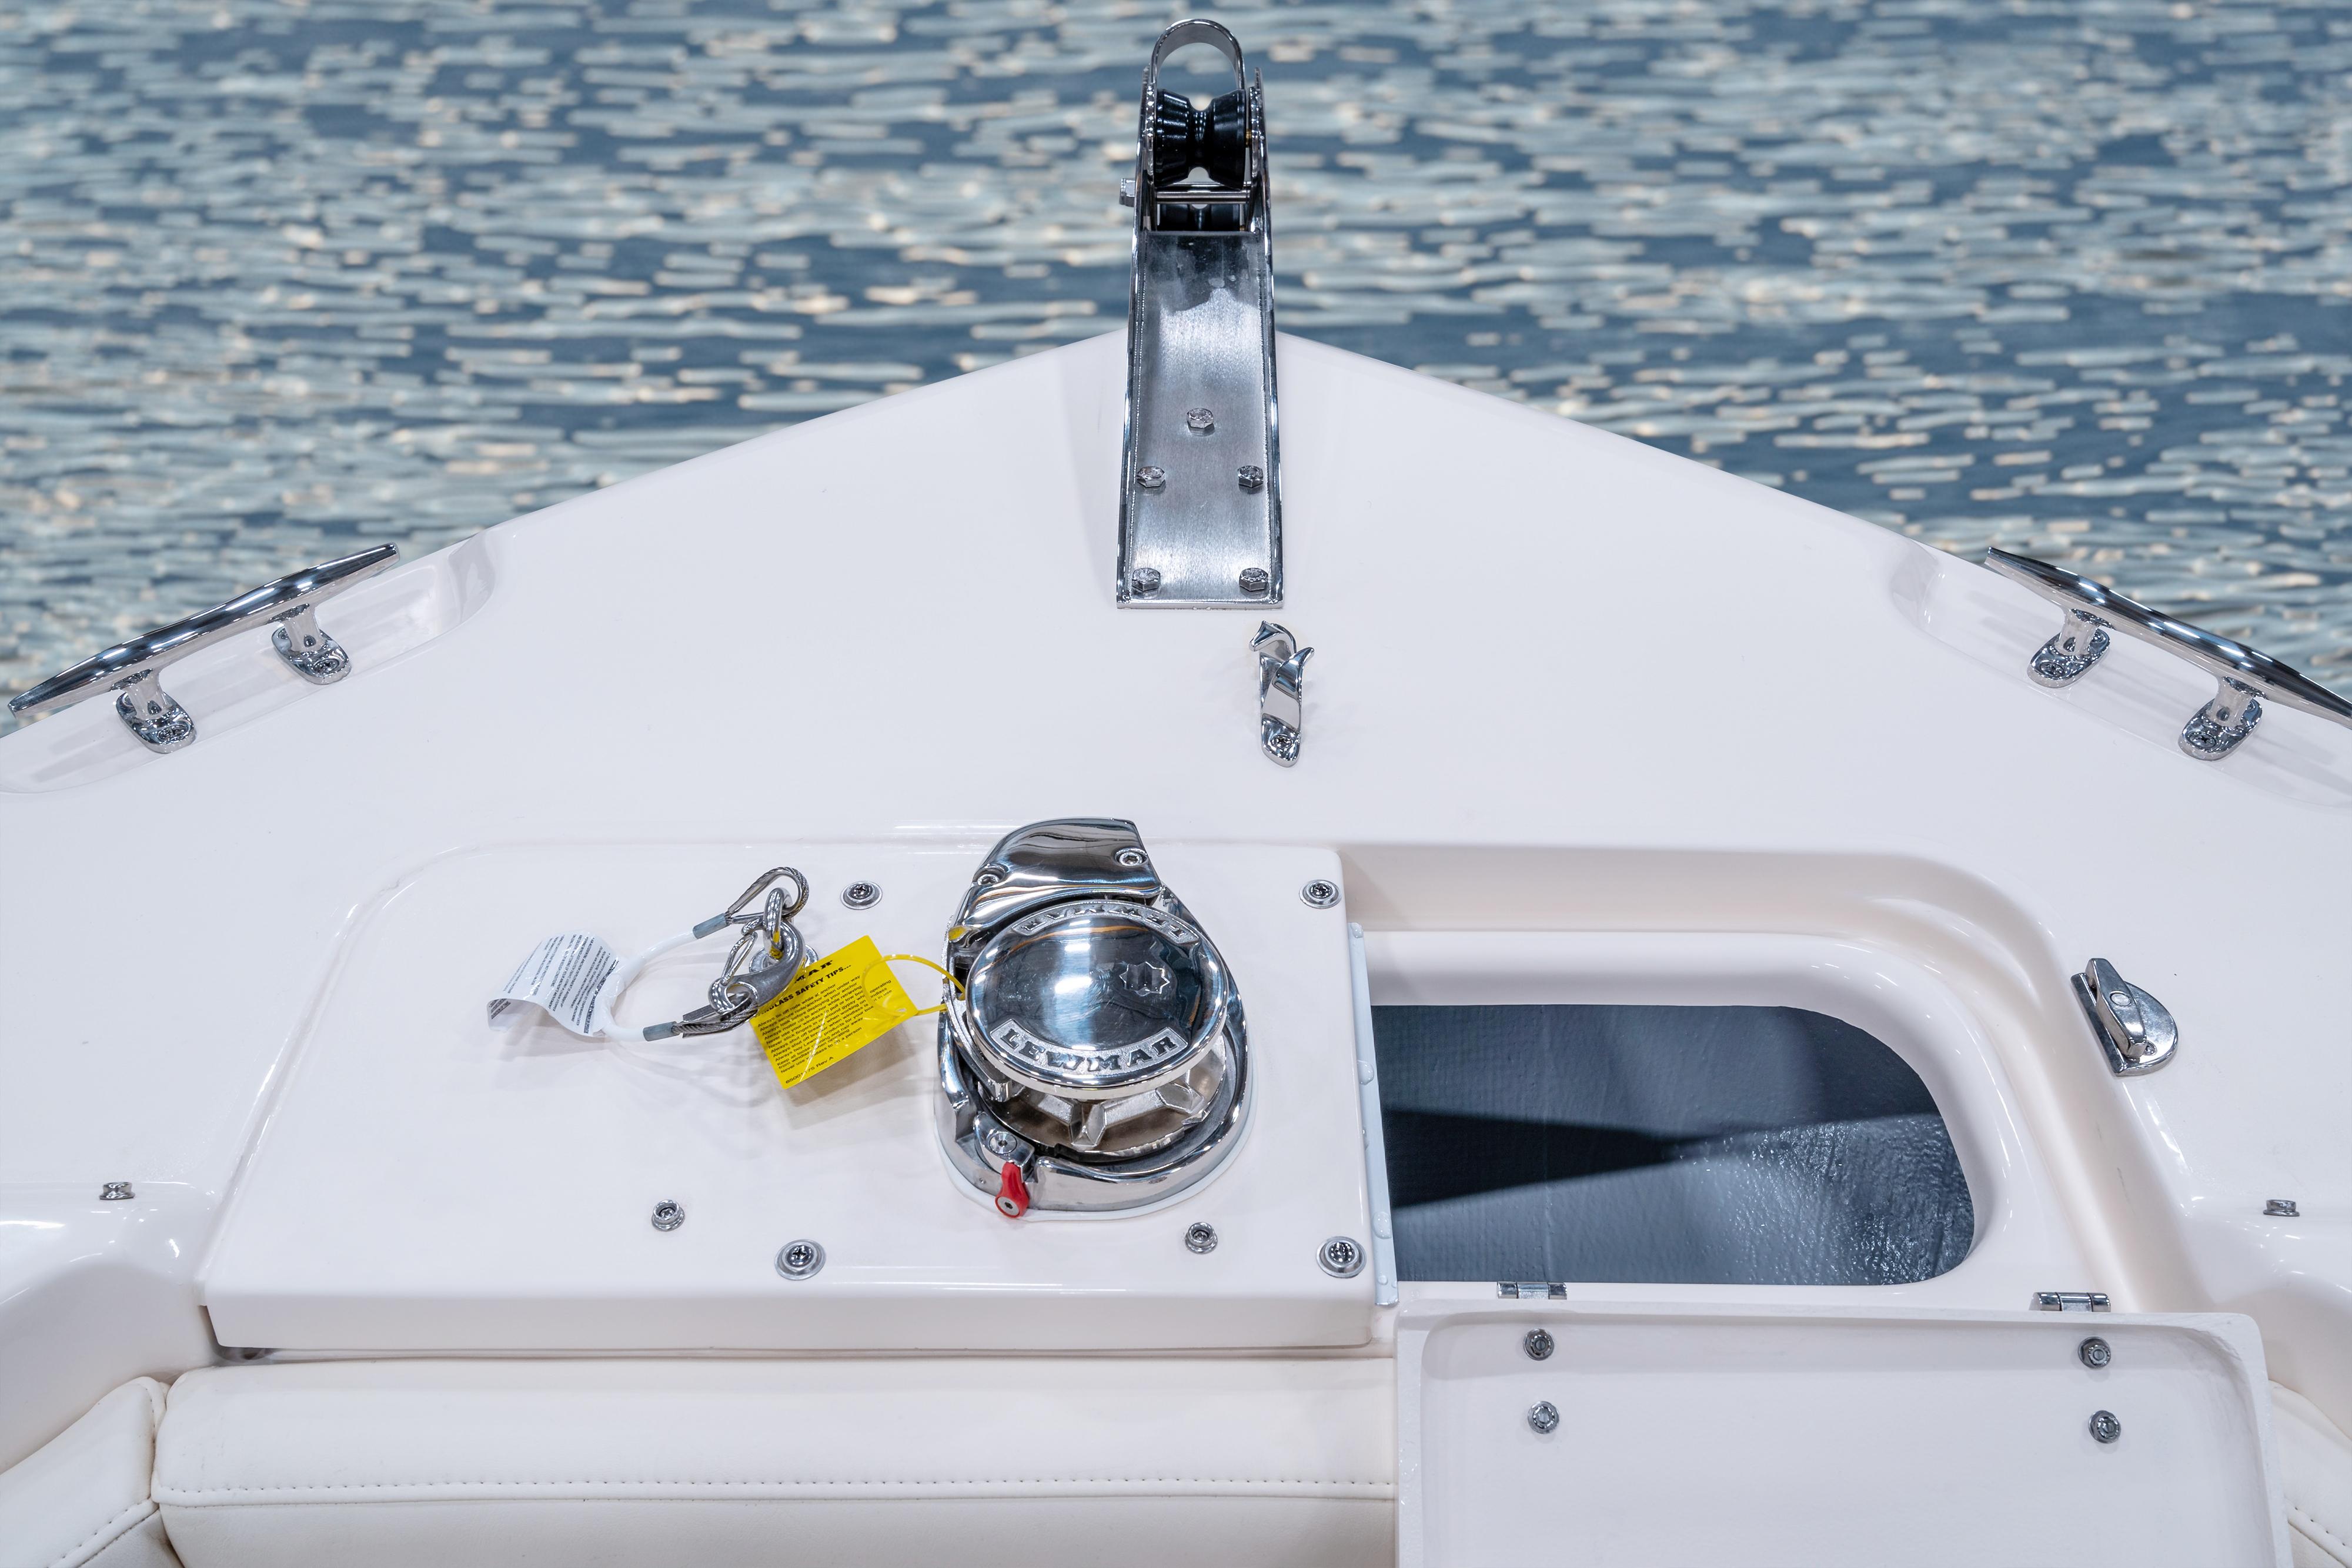 Grady-White Freedom 255 25-foot dual console windlass